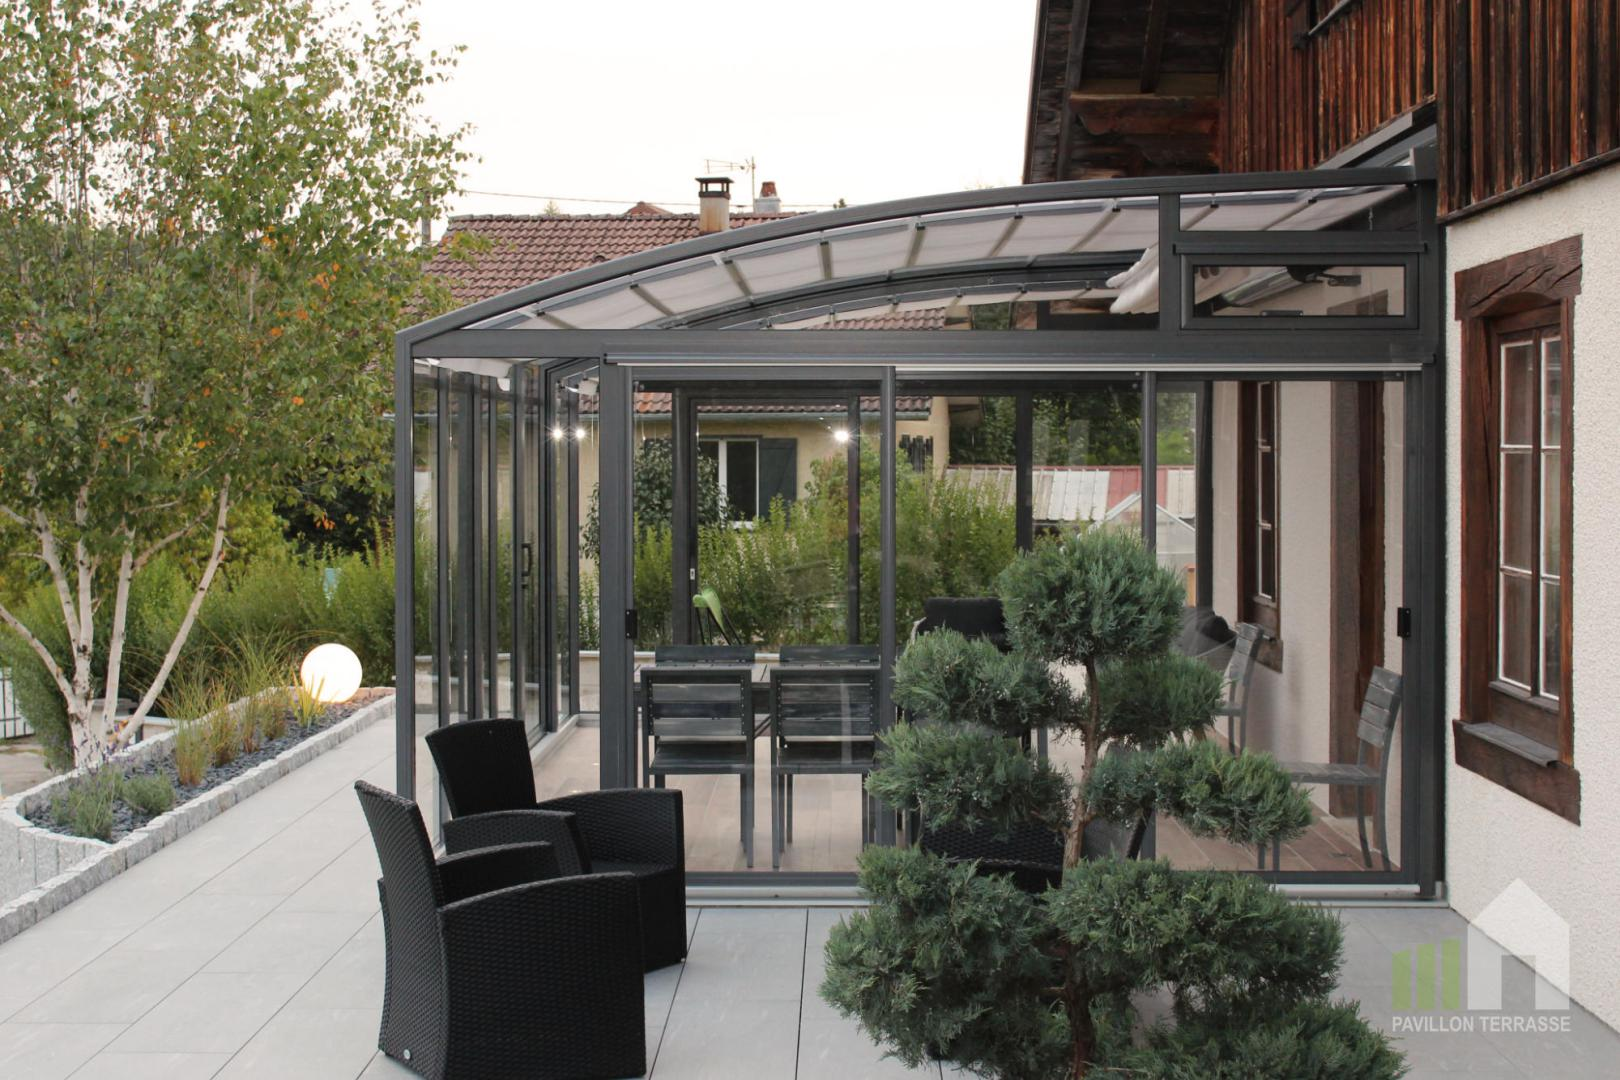 abris terrasse pavillon i solar v randa coulissante mobile r tractable escamotable. Black Bedroom Furniture Sets. Home Design Ideas